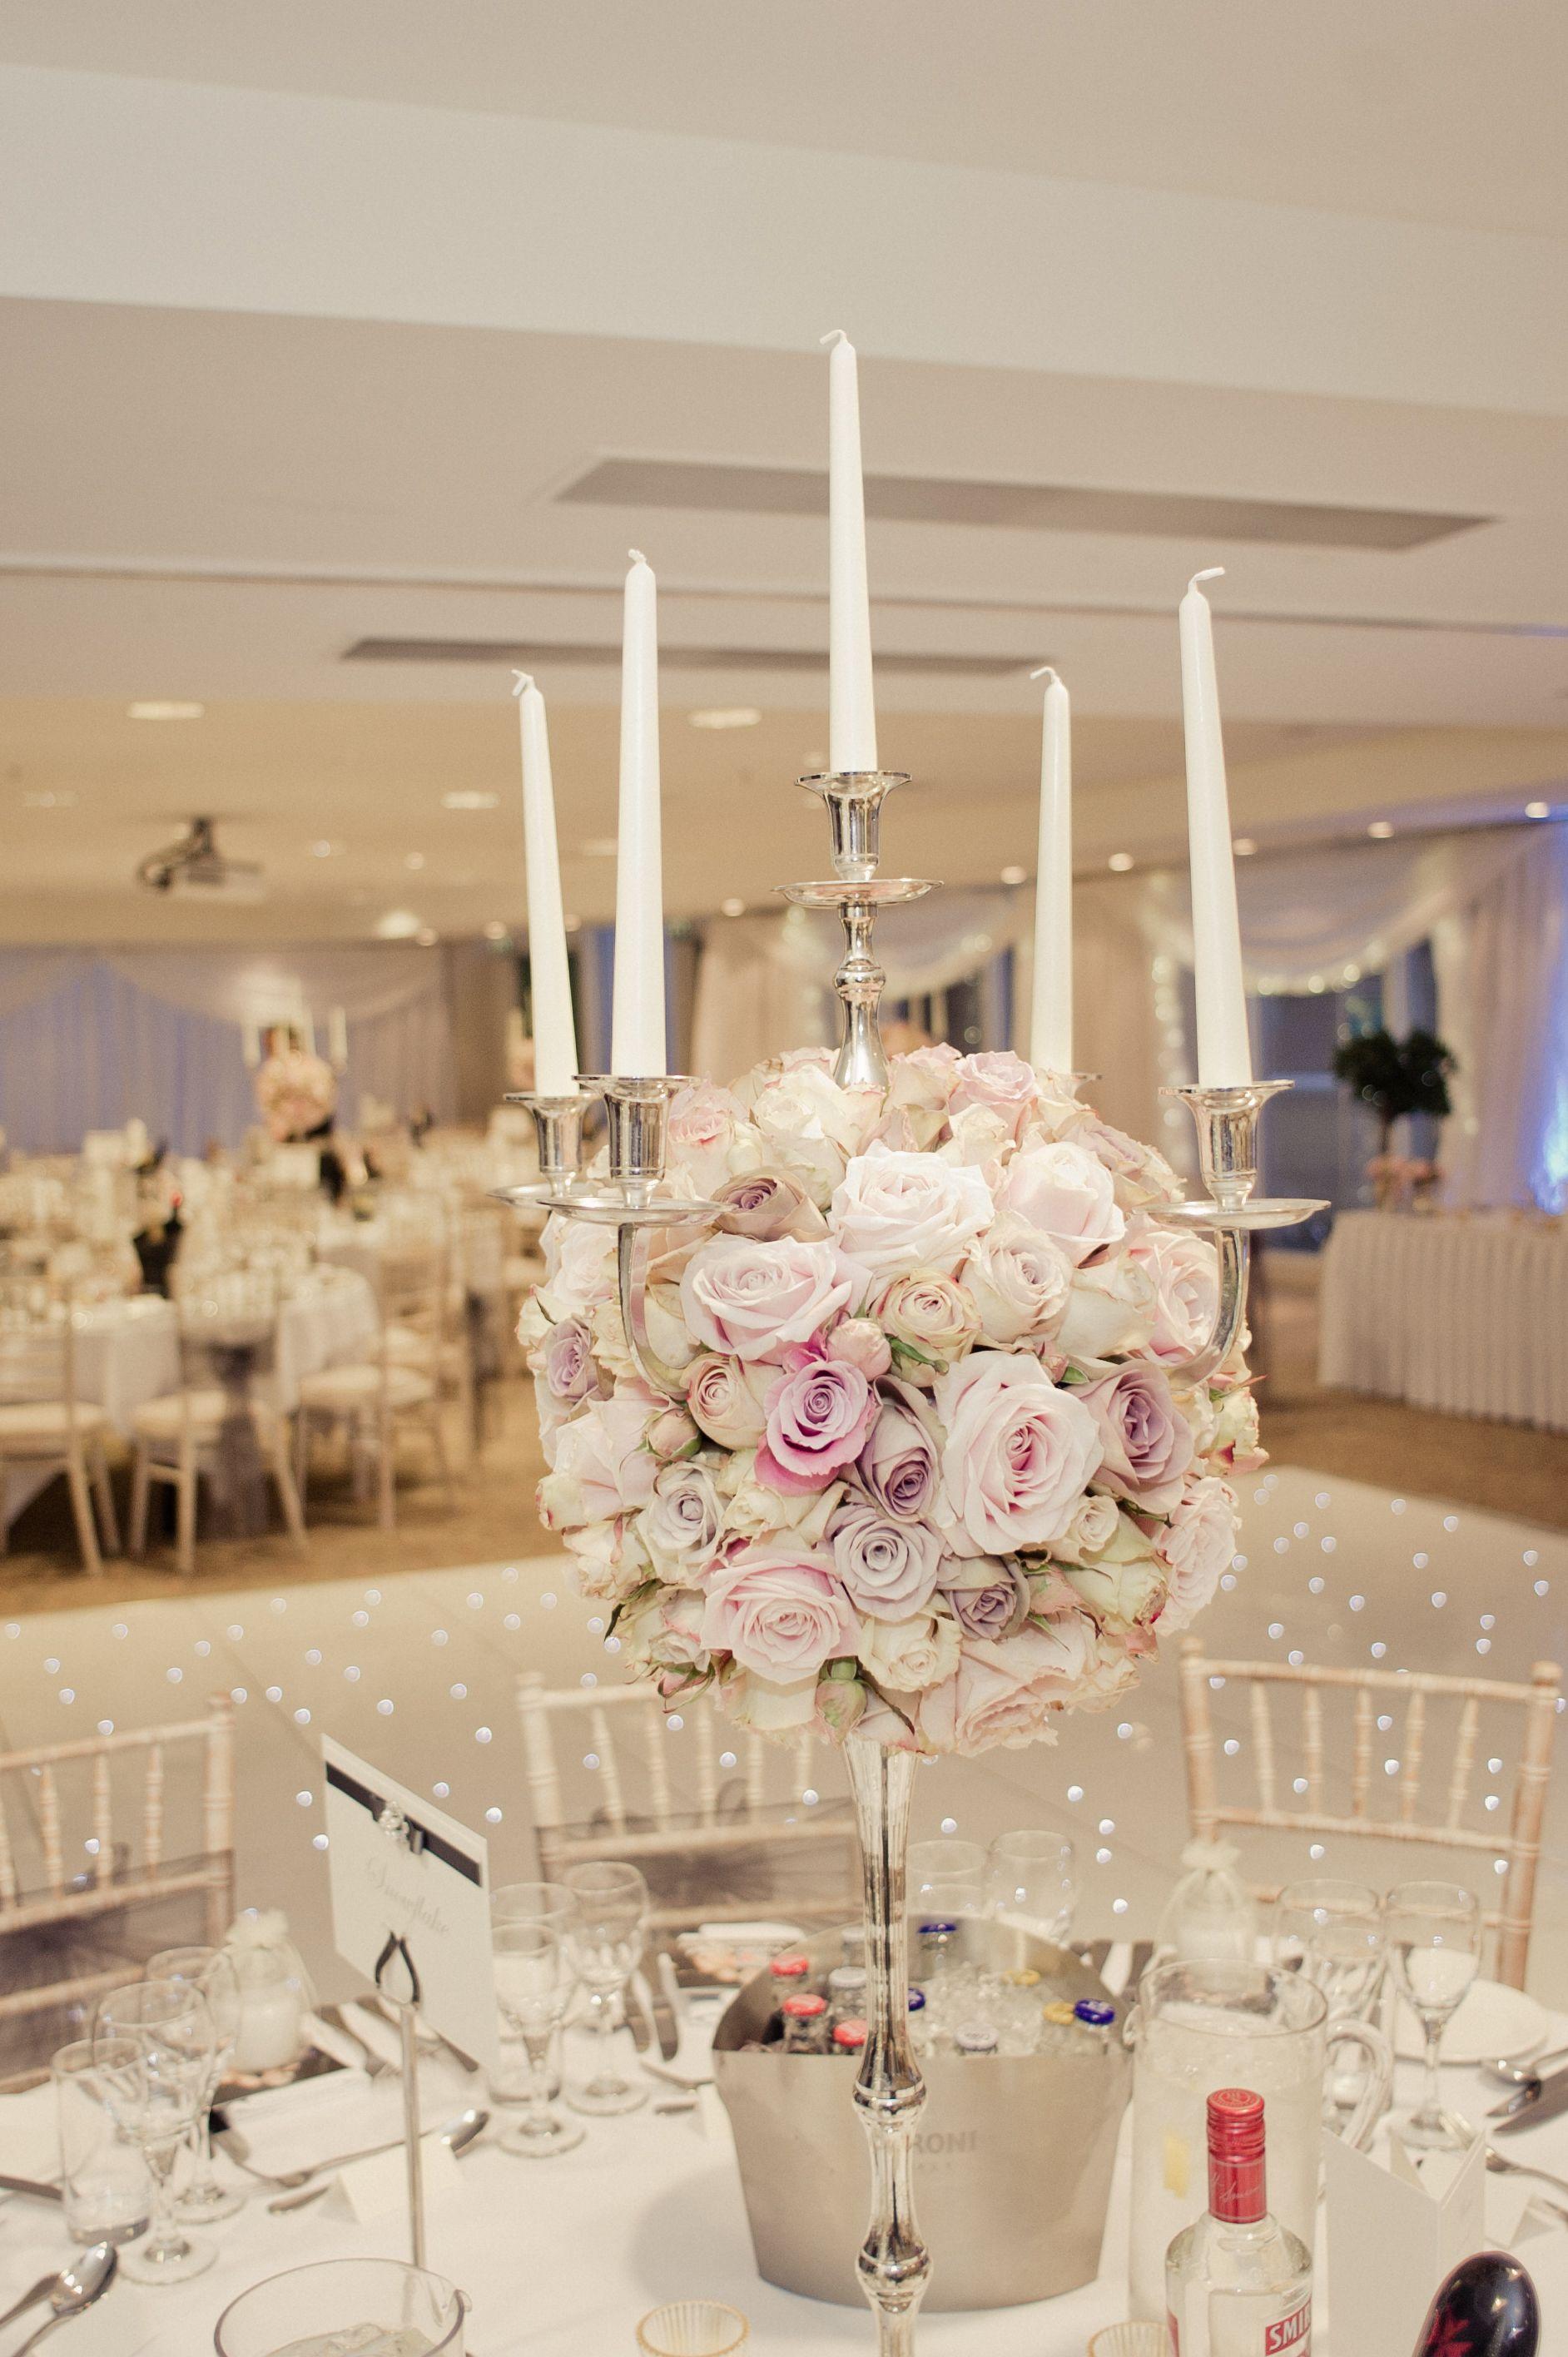 Stunning Christmas Themed Wedding Photo Taken At Natalie David S In December 2017 St Hotel Spa Cardiff